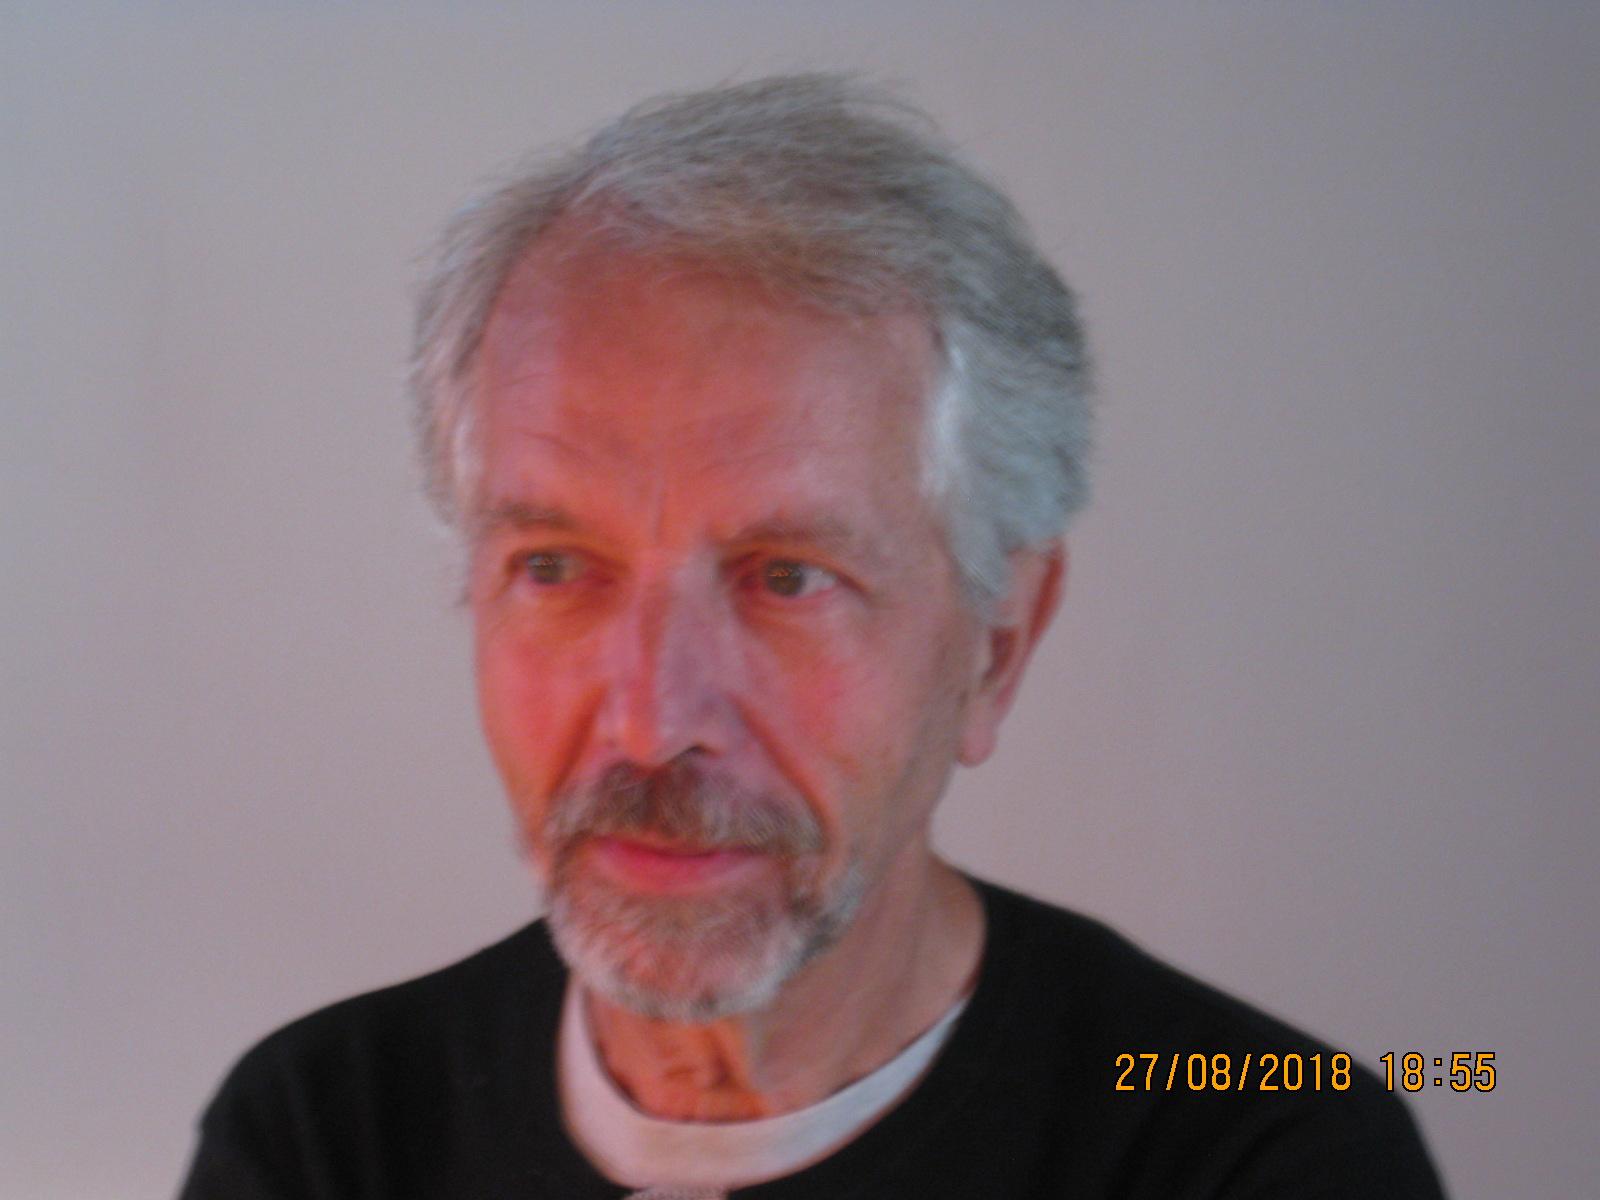 Flemming Riber